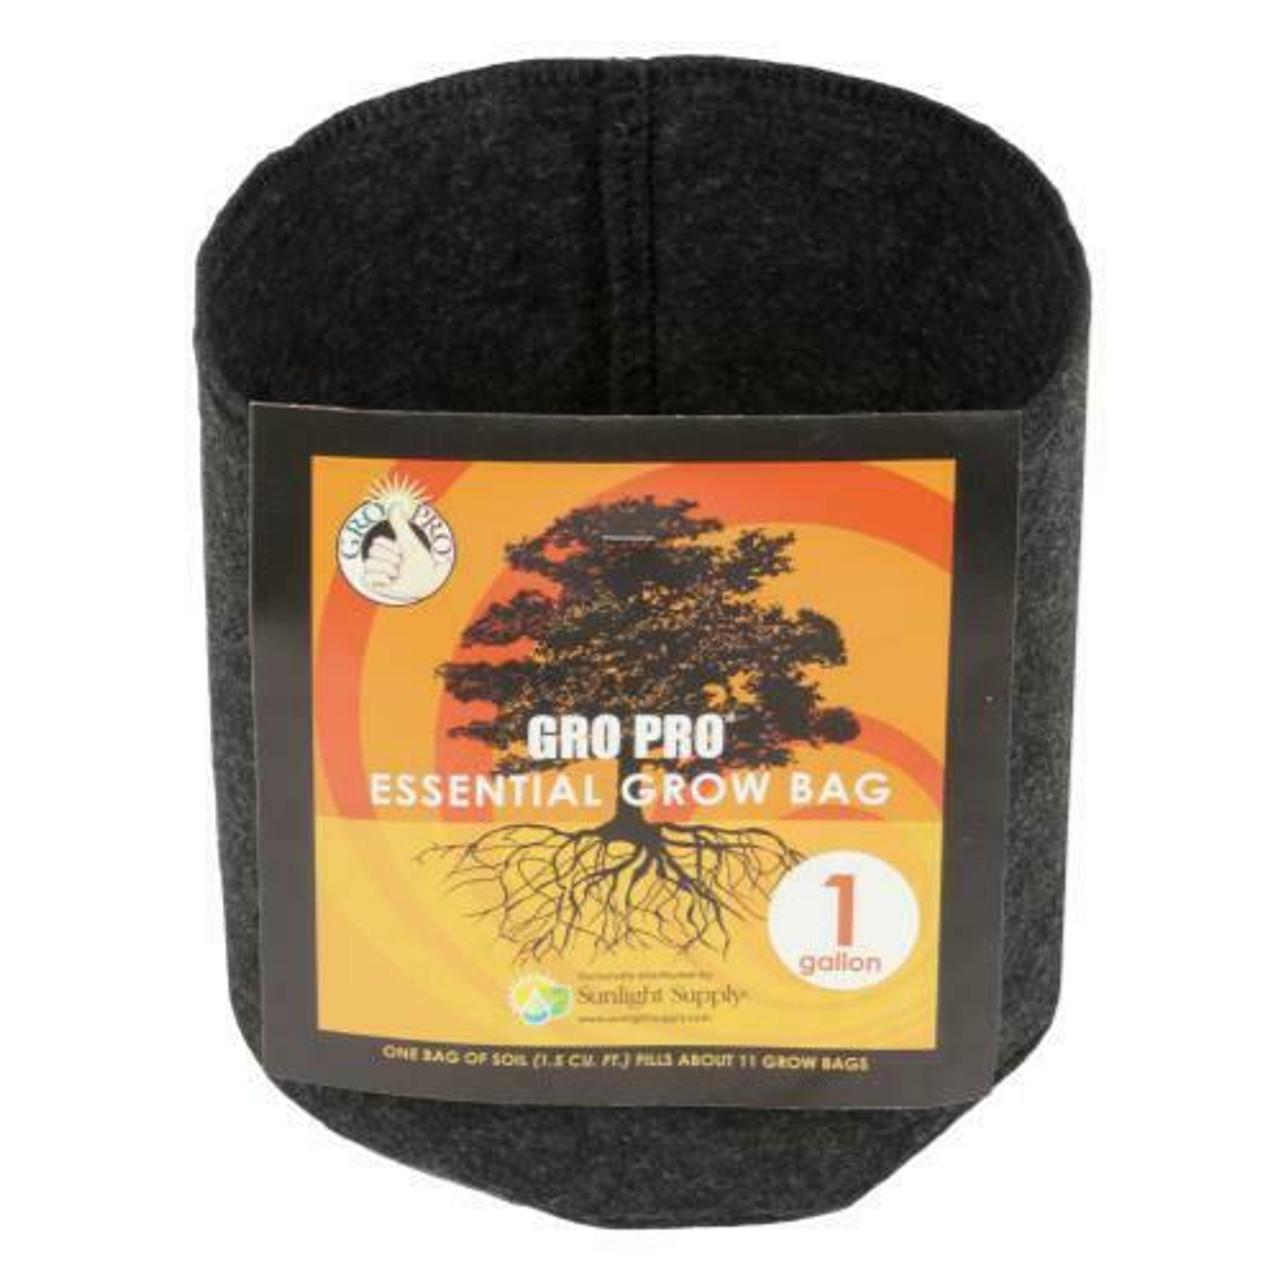 Gro Pro Essential Round Fabric Pot - Black 1 Gallon - 1